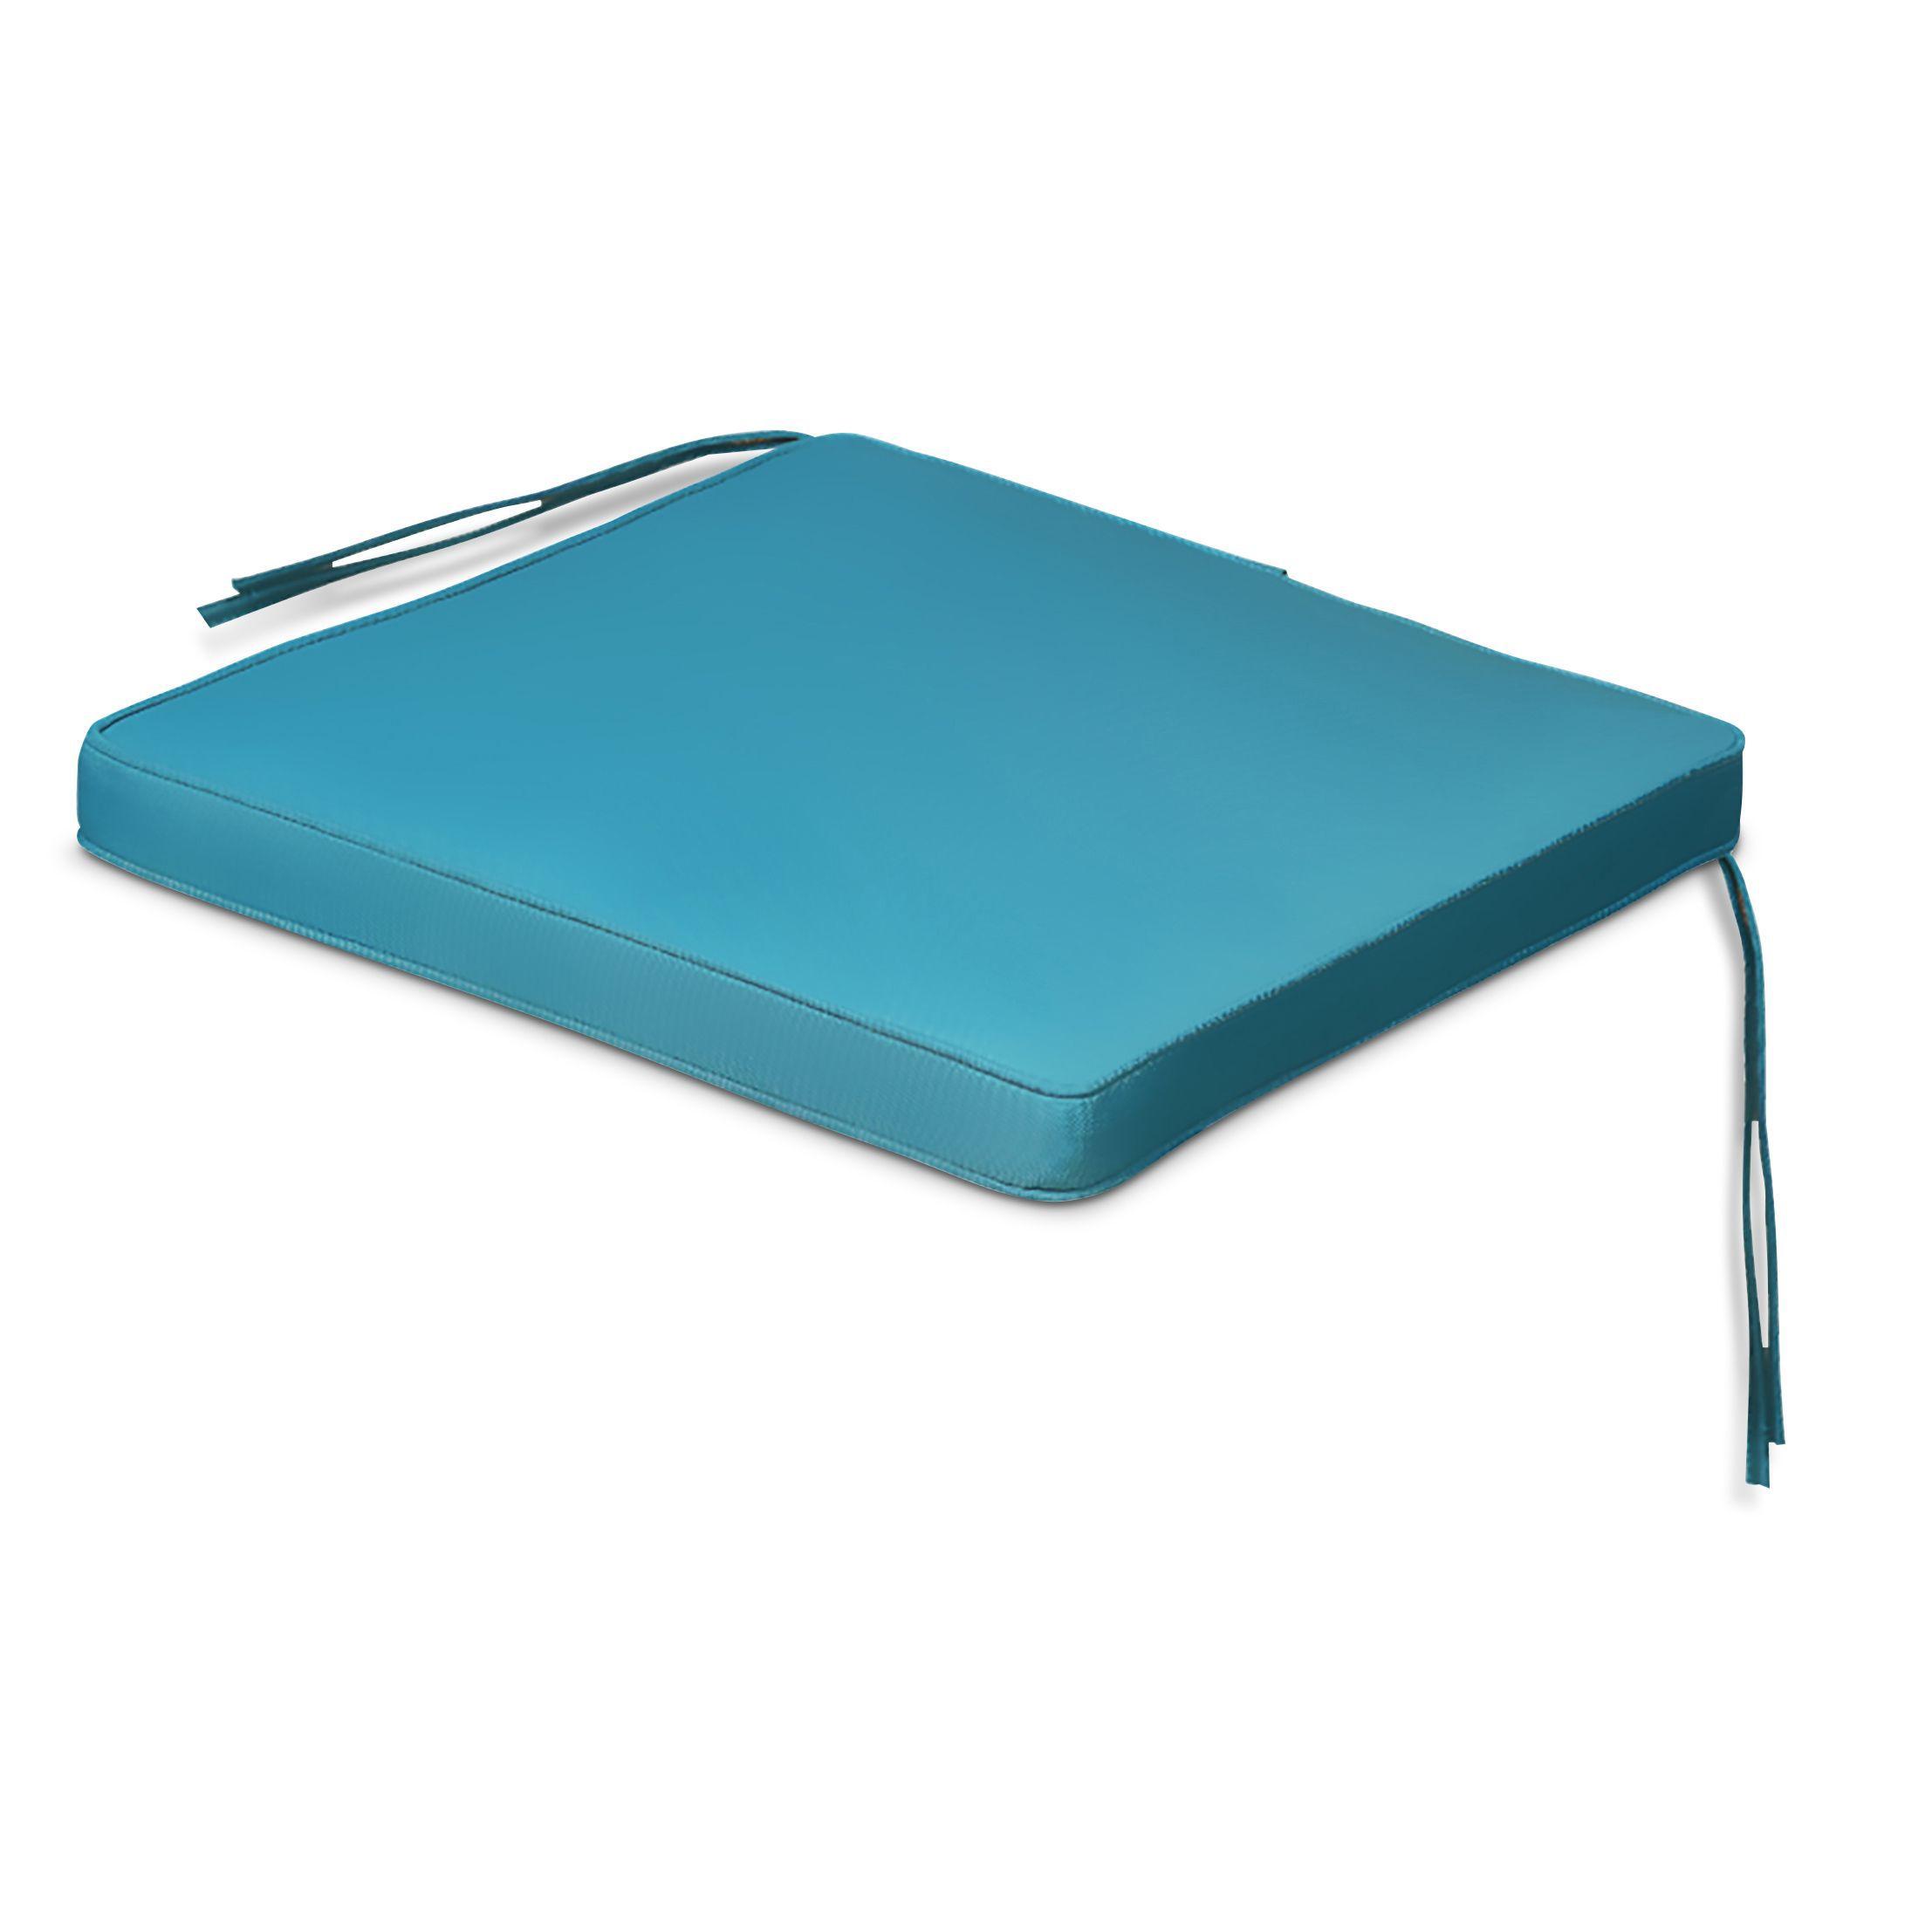 Tiga Biscay Blue Plain Seat Pad